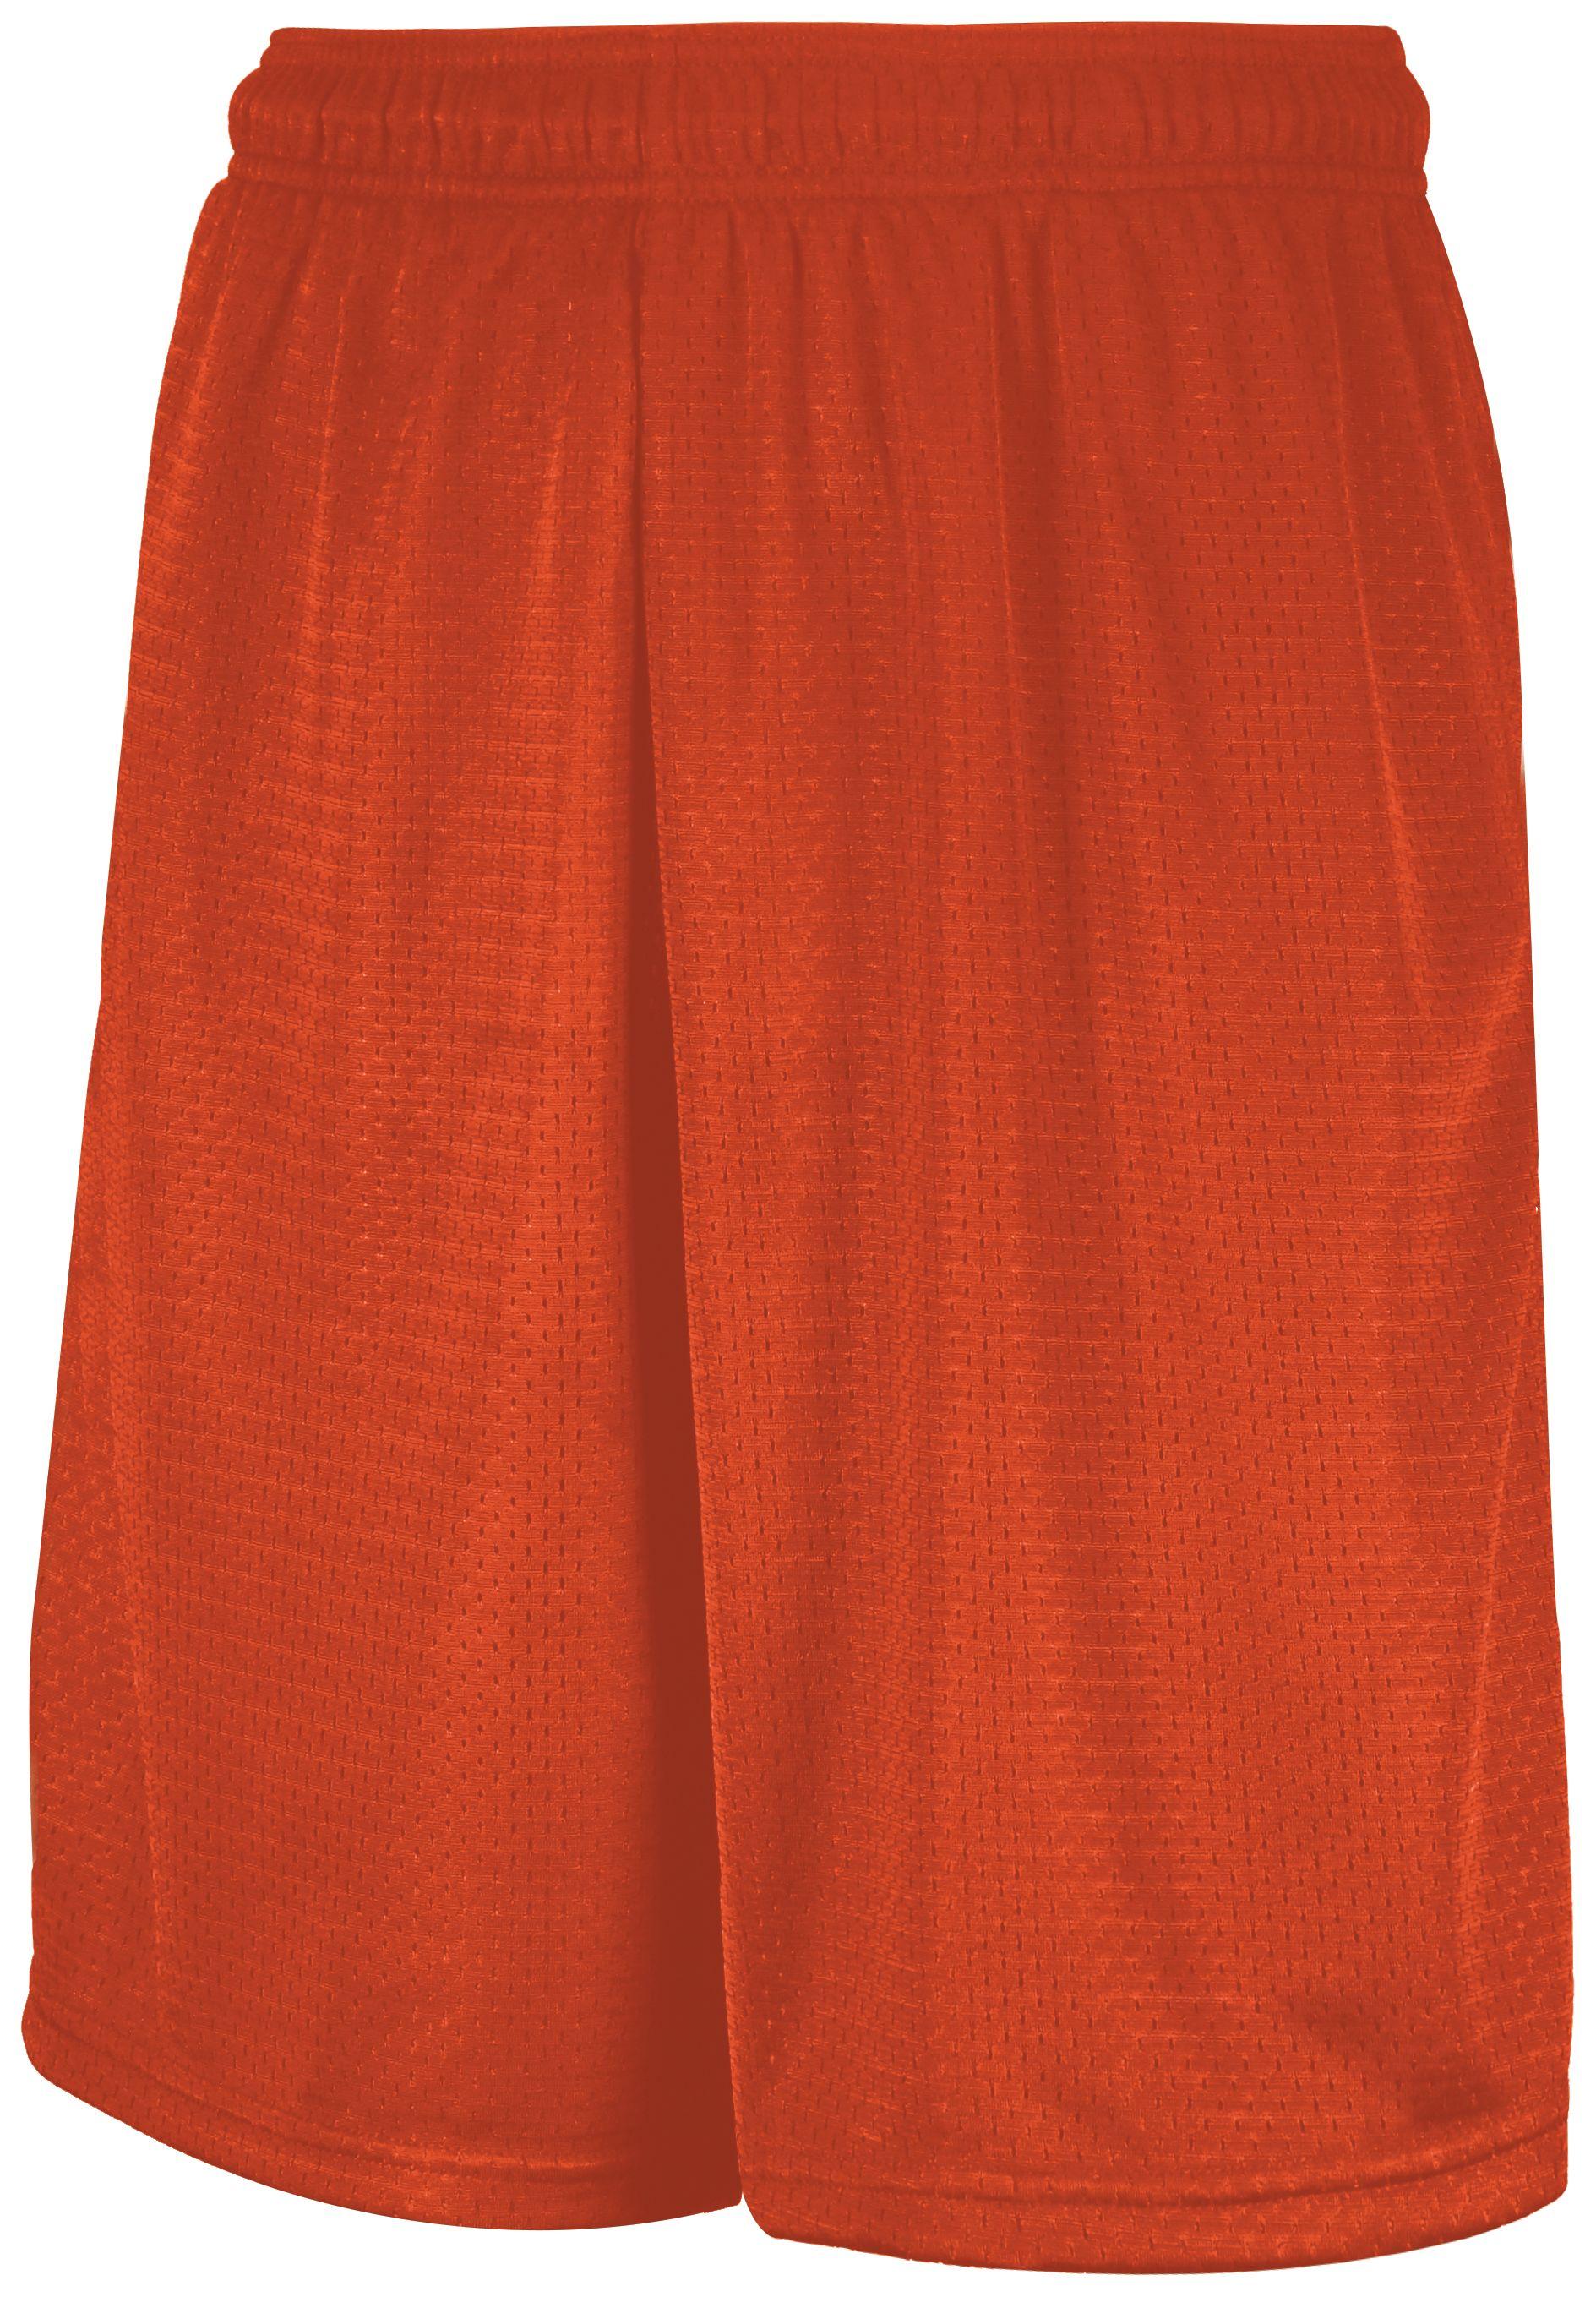 Mesh Shorts With Pockets - Burnt Orange